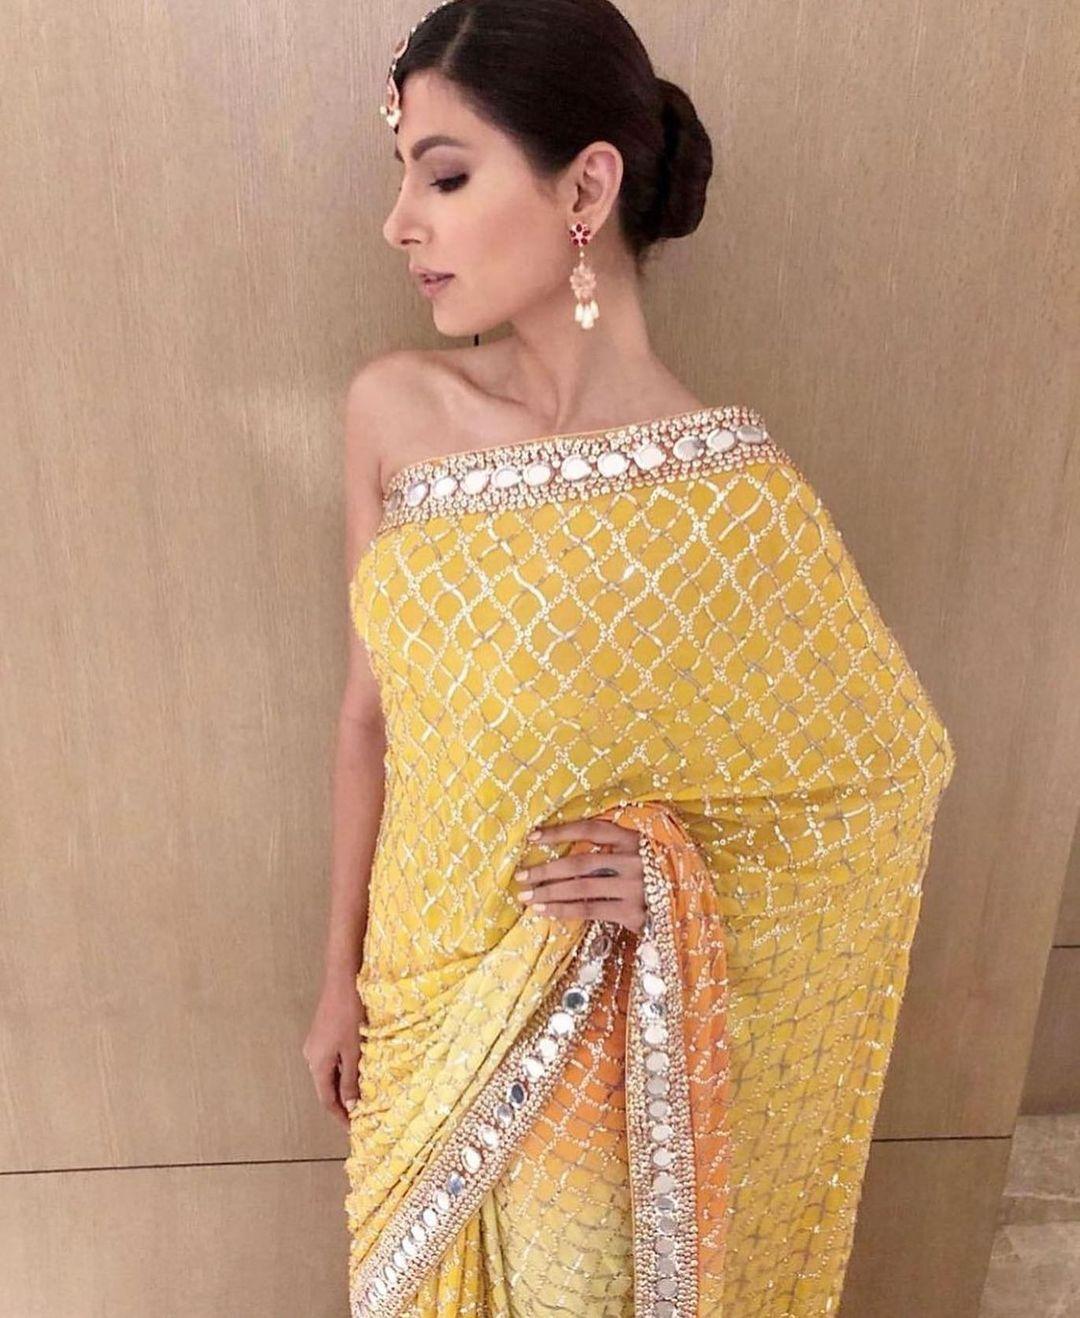 Beautiful yellow color designer saree with sequin work. 2021-07-02